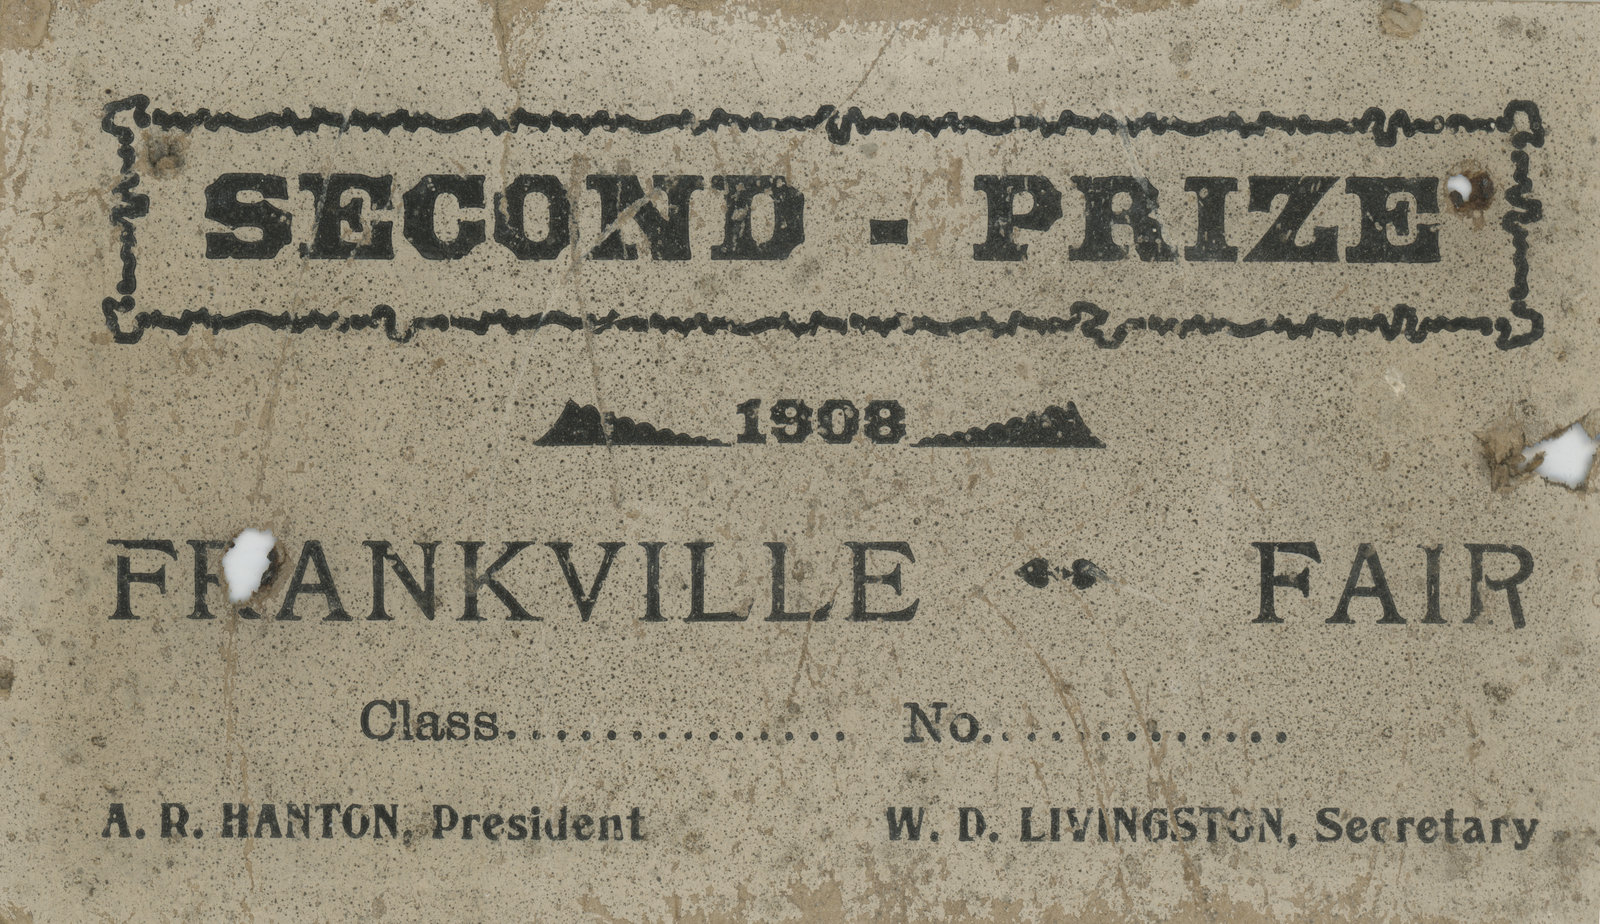 Frankville Fair Prize Certificate